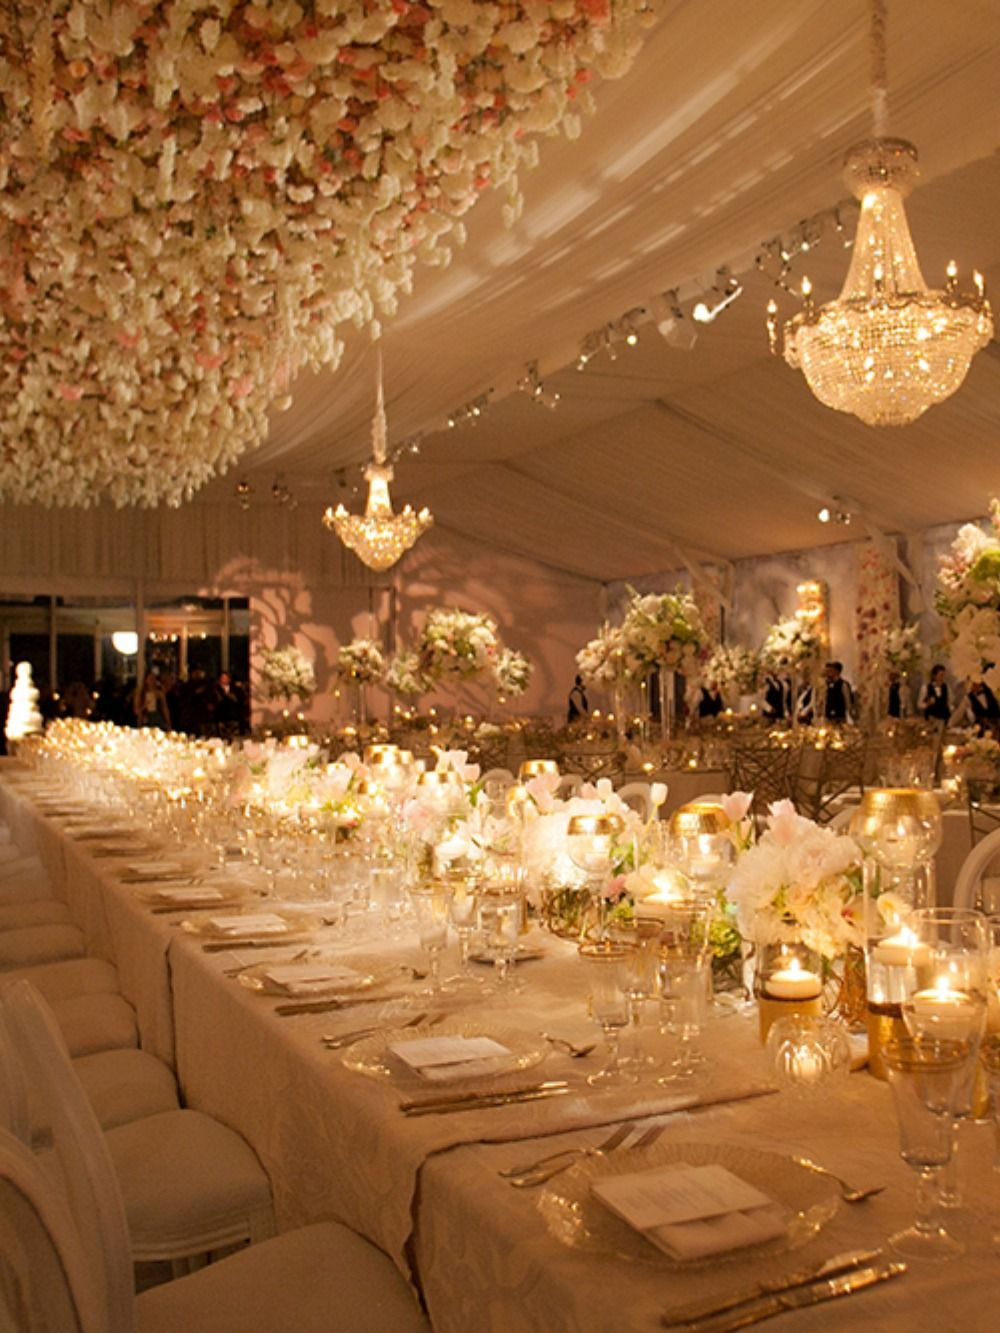 Rebecca Christian Real Houston Wedding Weddings In Houston Extravagant Wedding Decor Blush Wedding Theme Table Arrangements Wedding